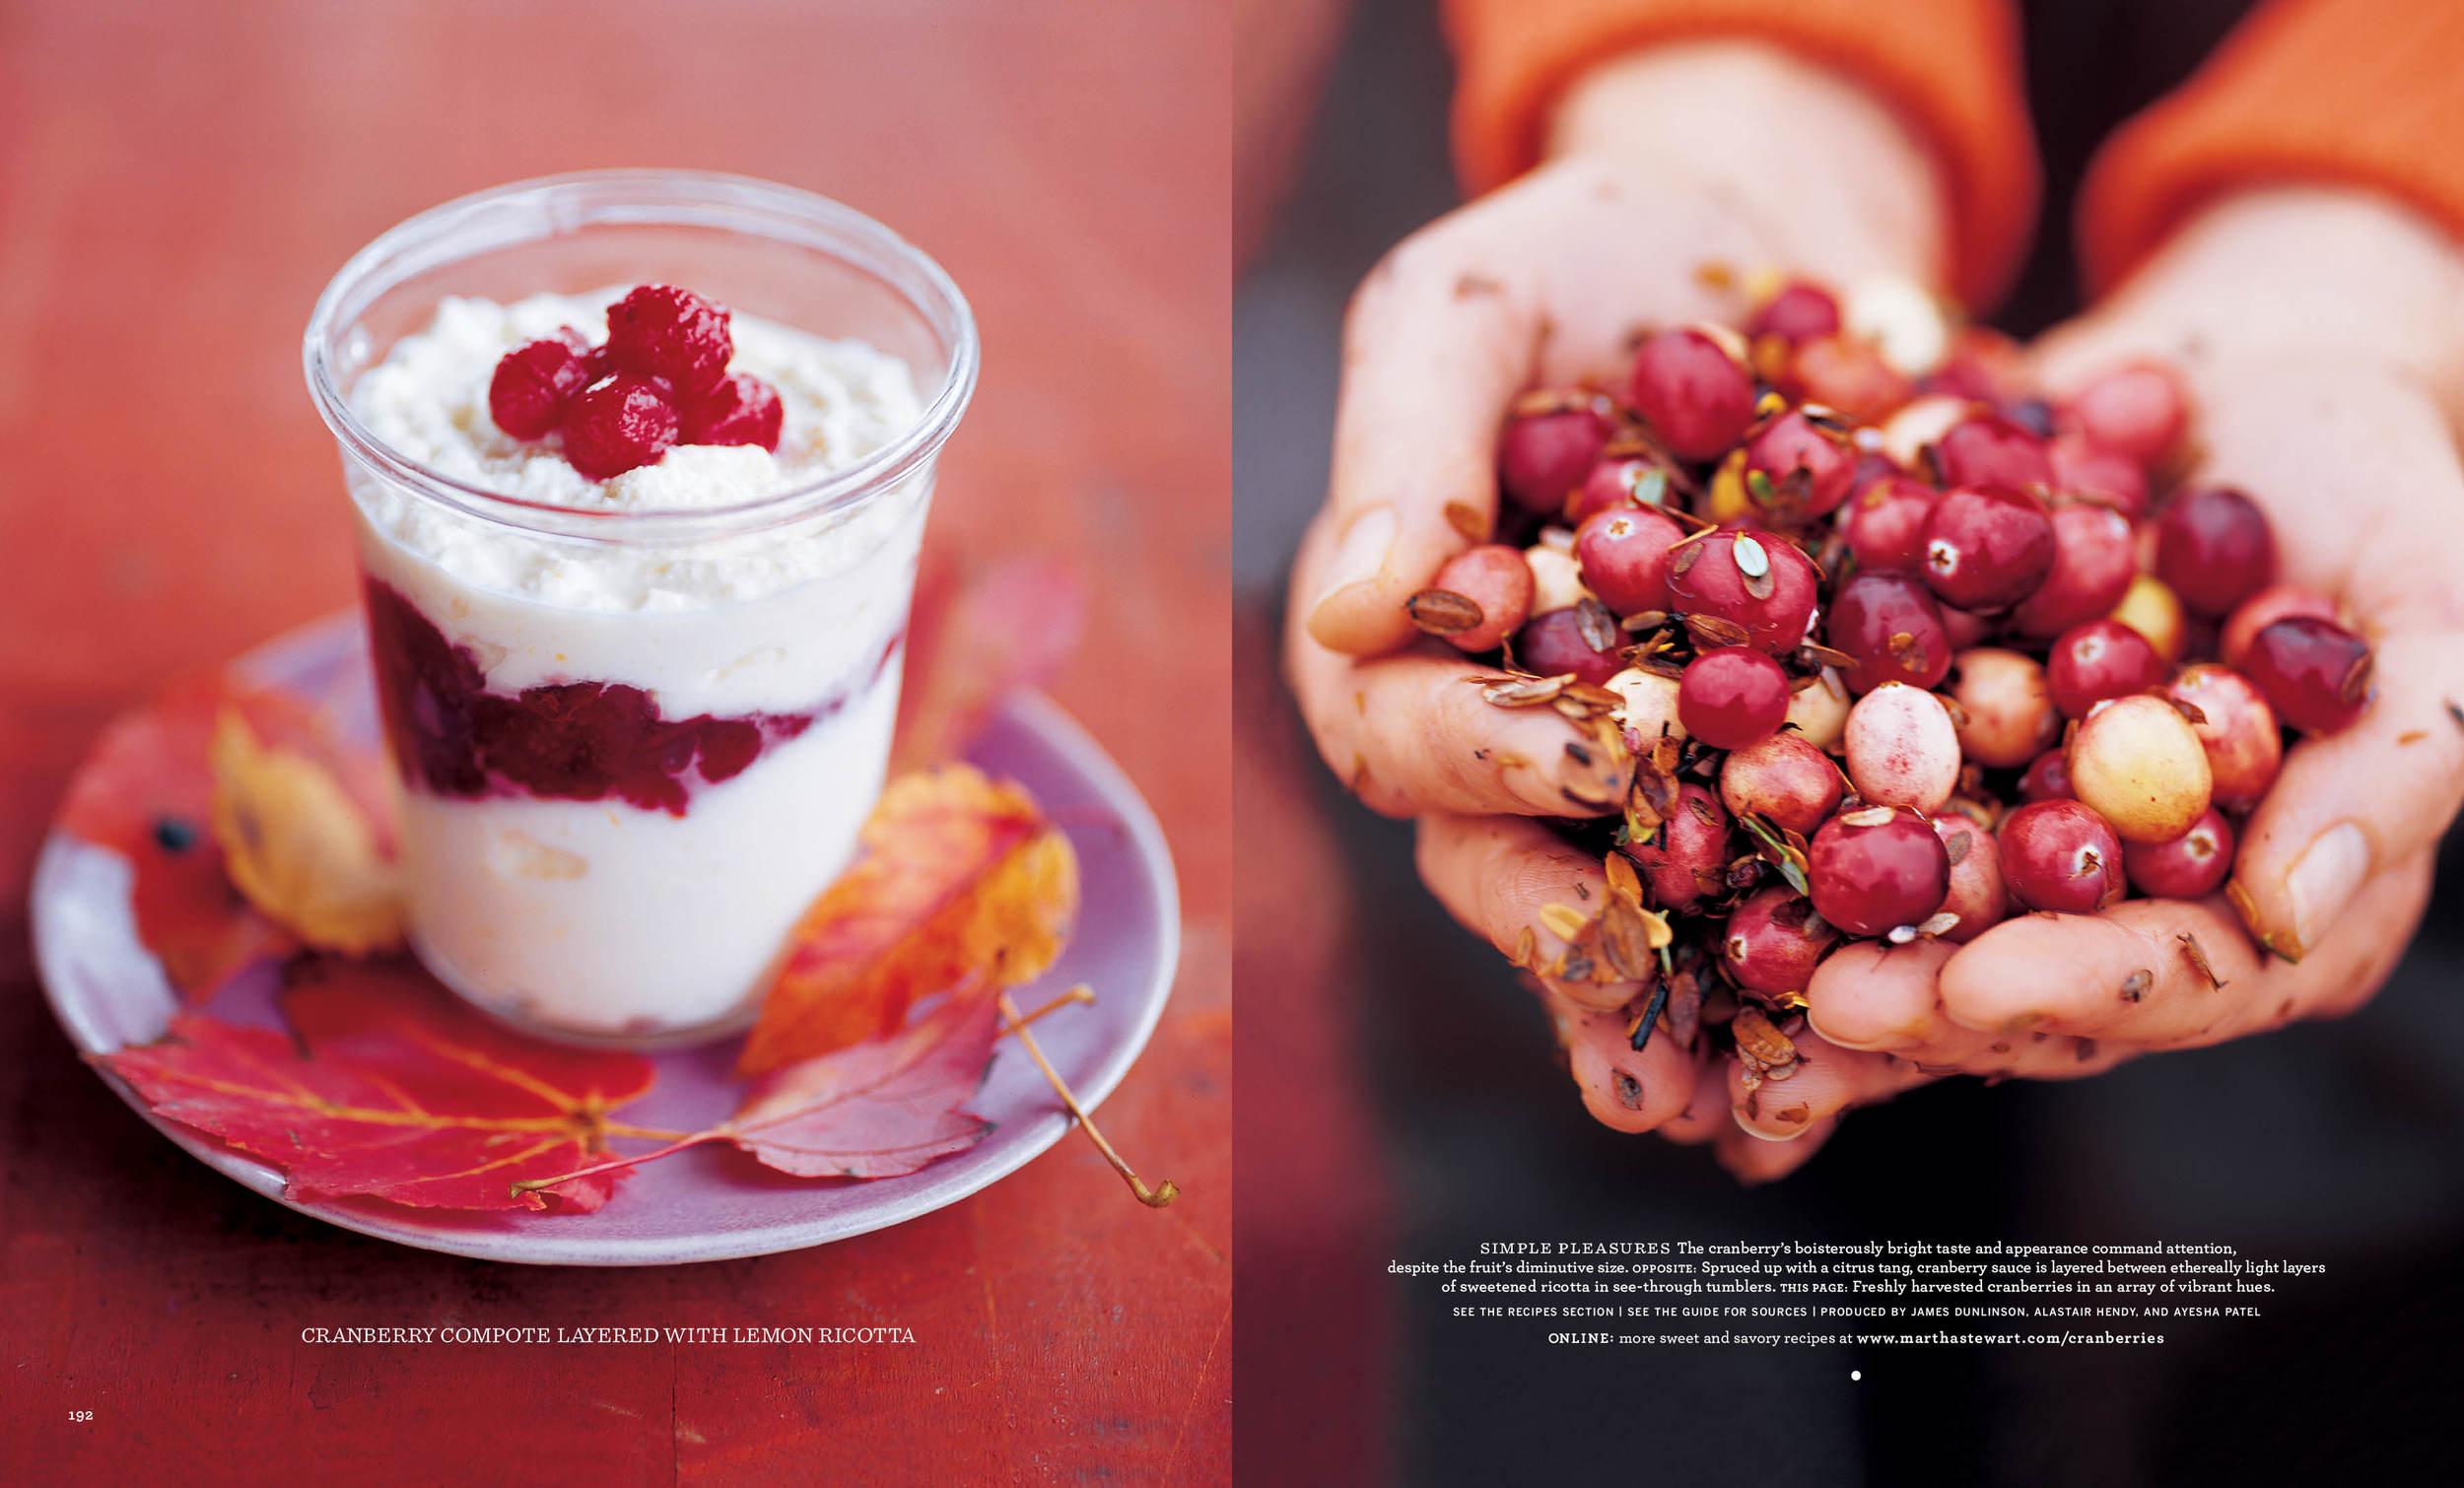 Cranberries4 copy.jpg